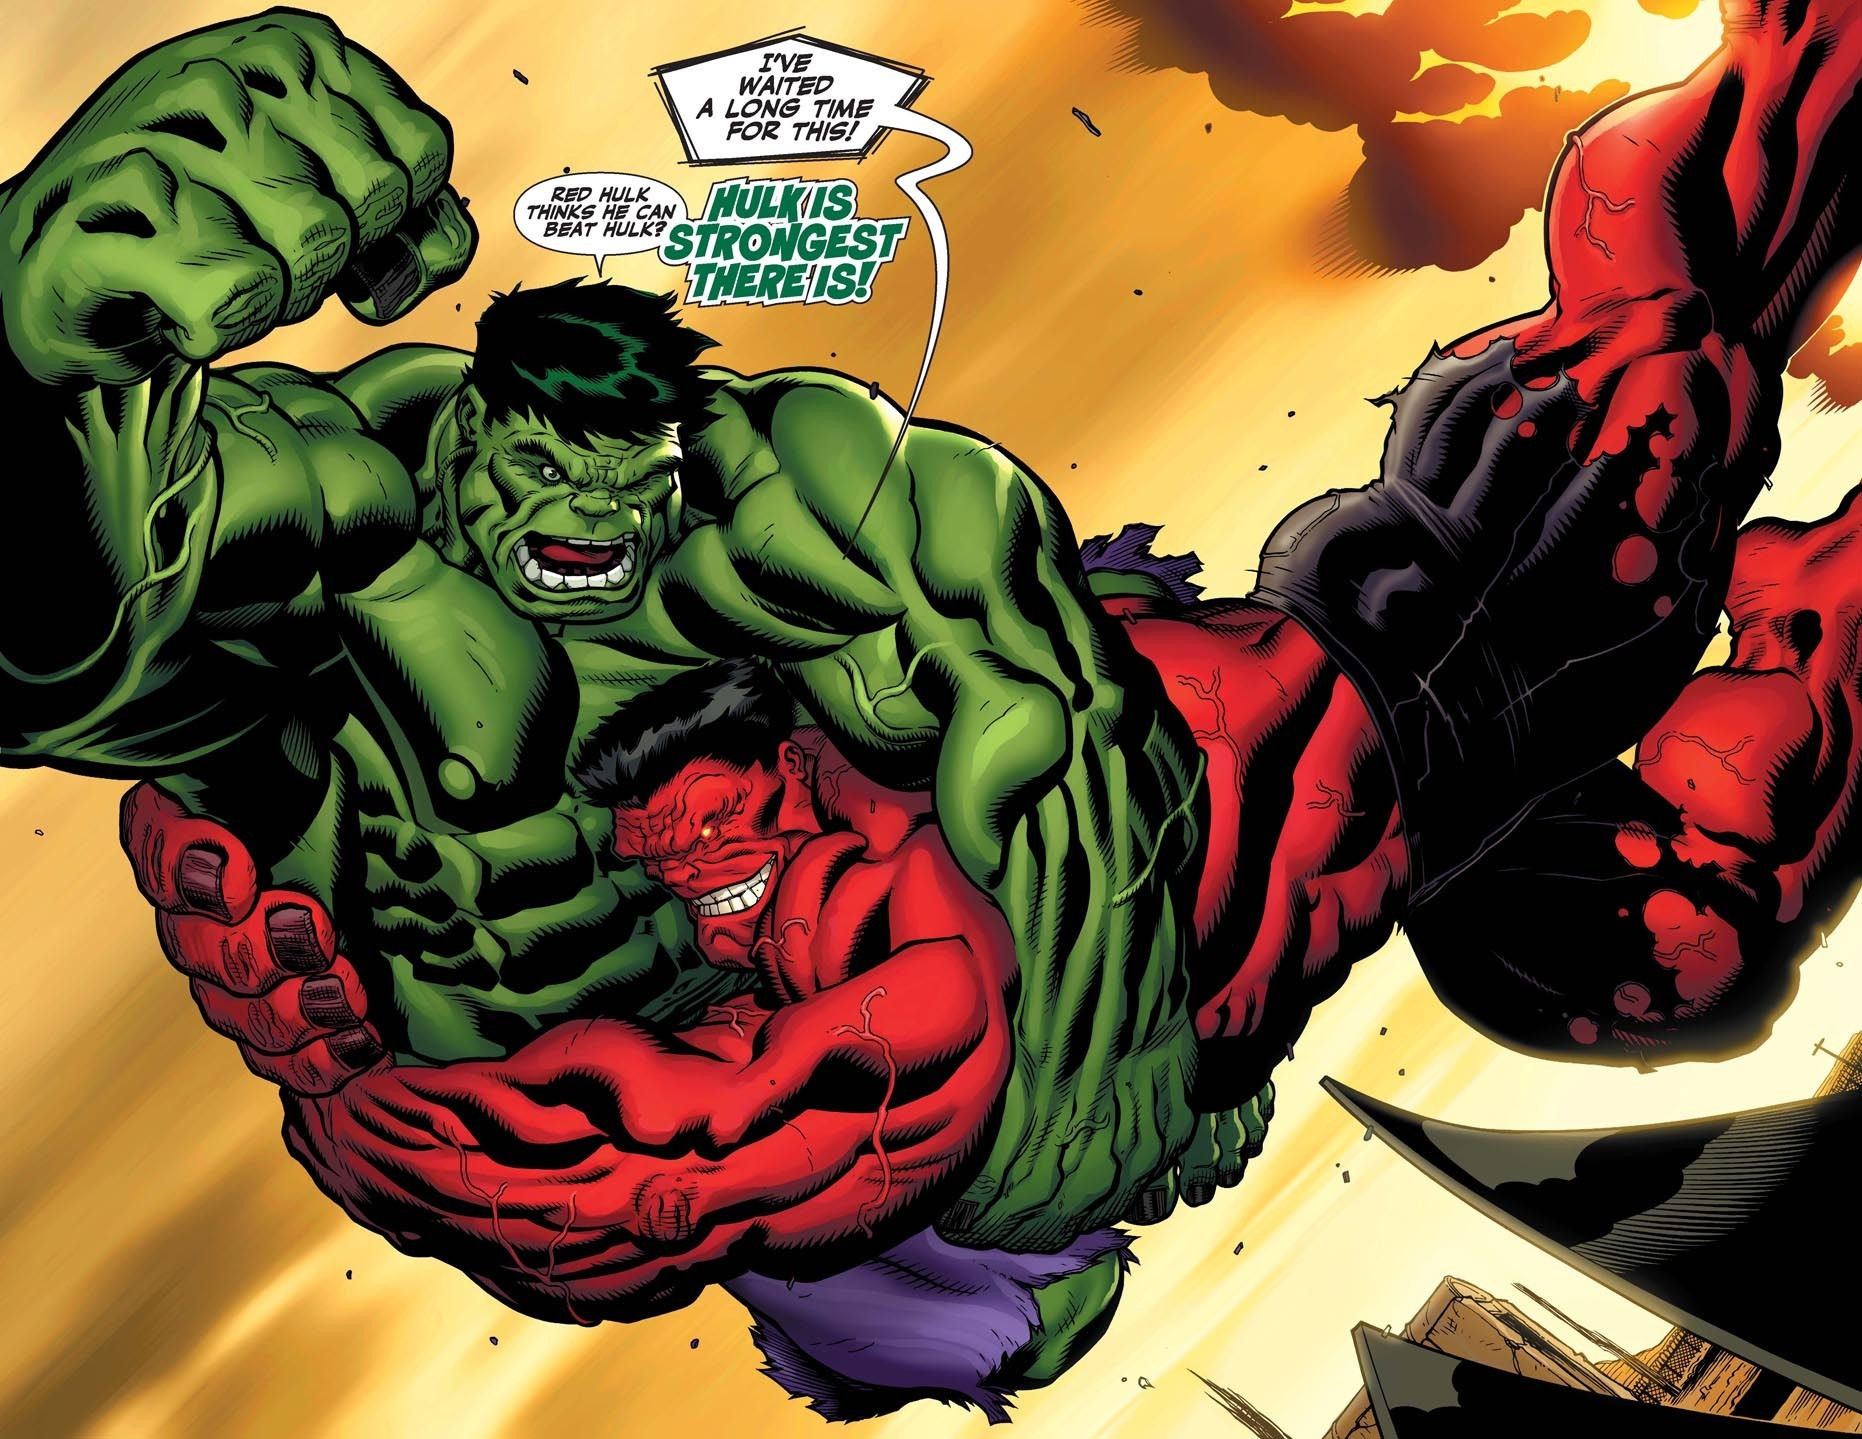 Hulk vs red hulk marvel comics 8625074 1862 1439